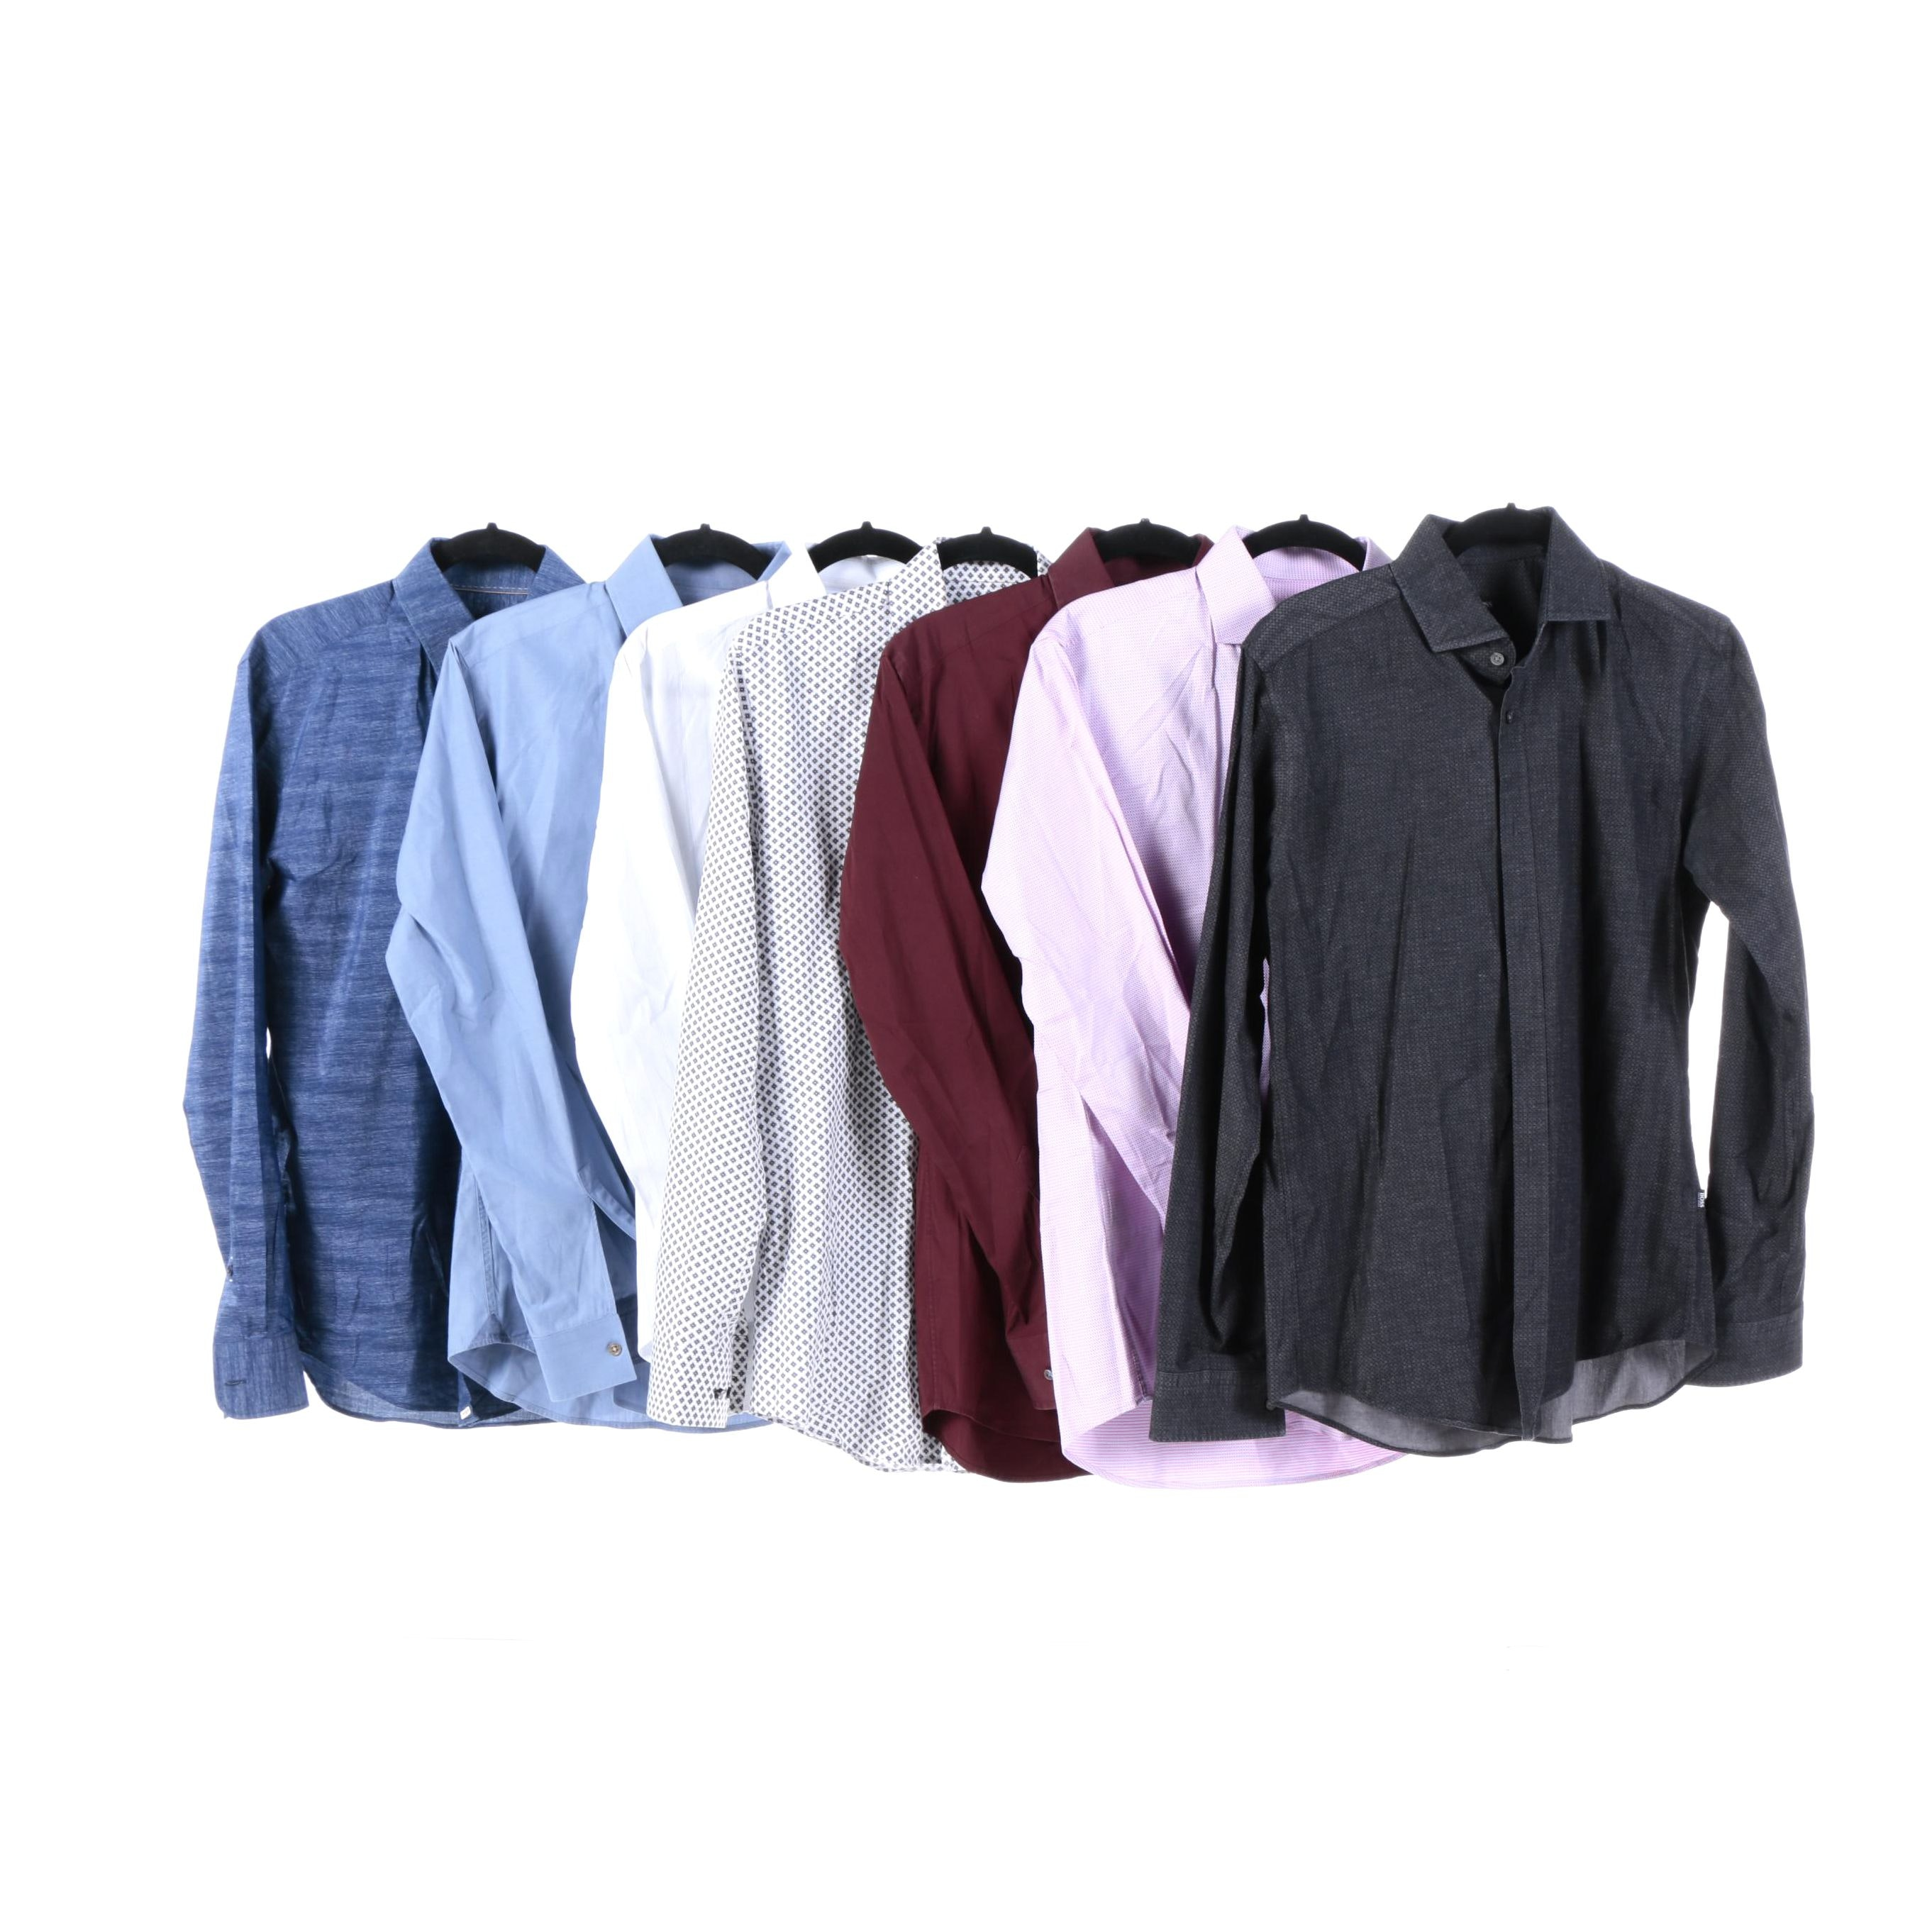 Men's Hugo Boss Dress Shirts